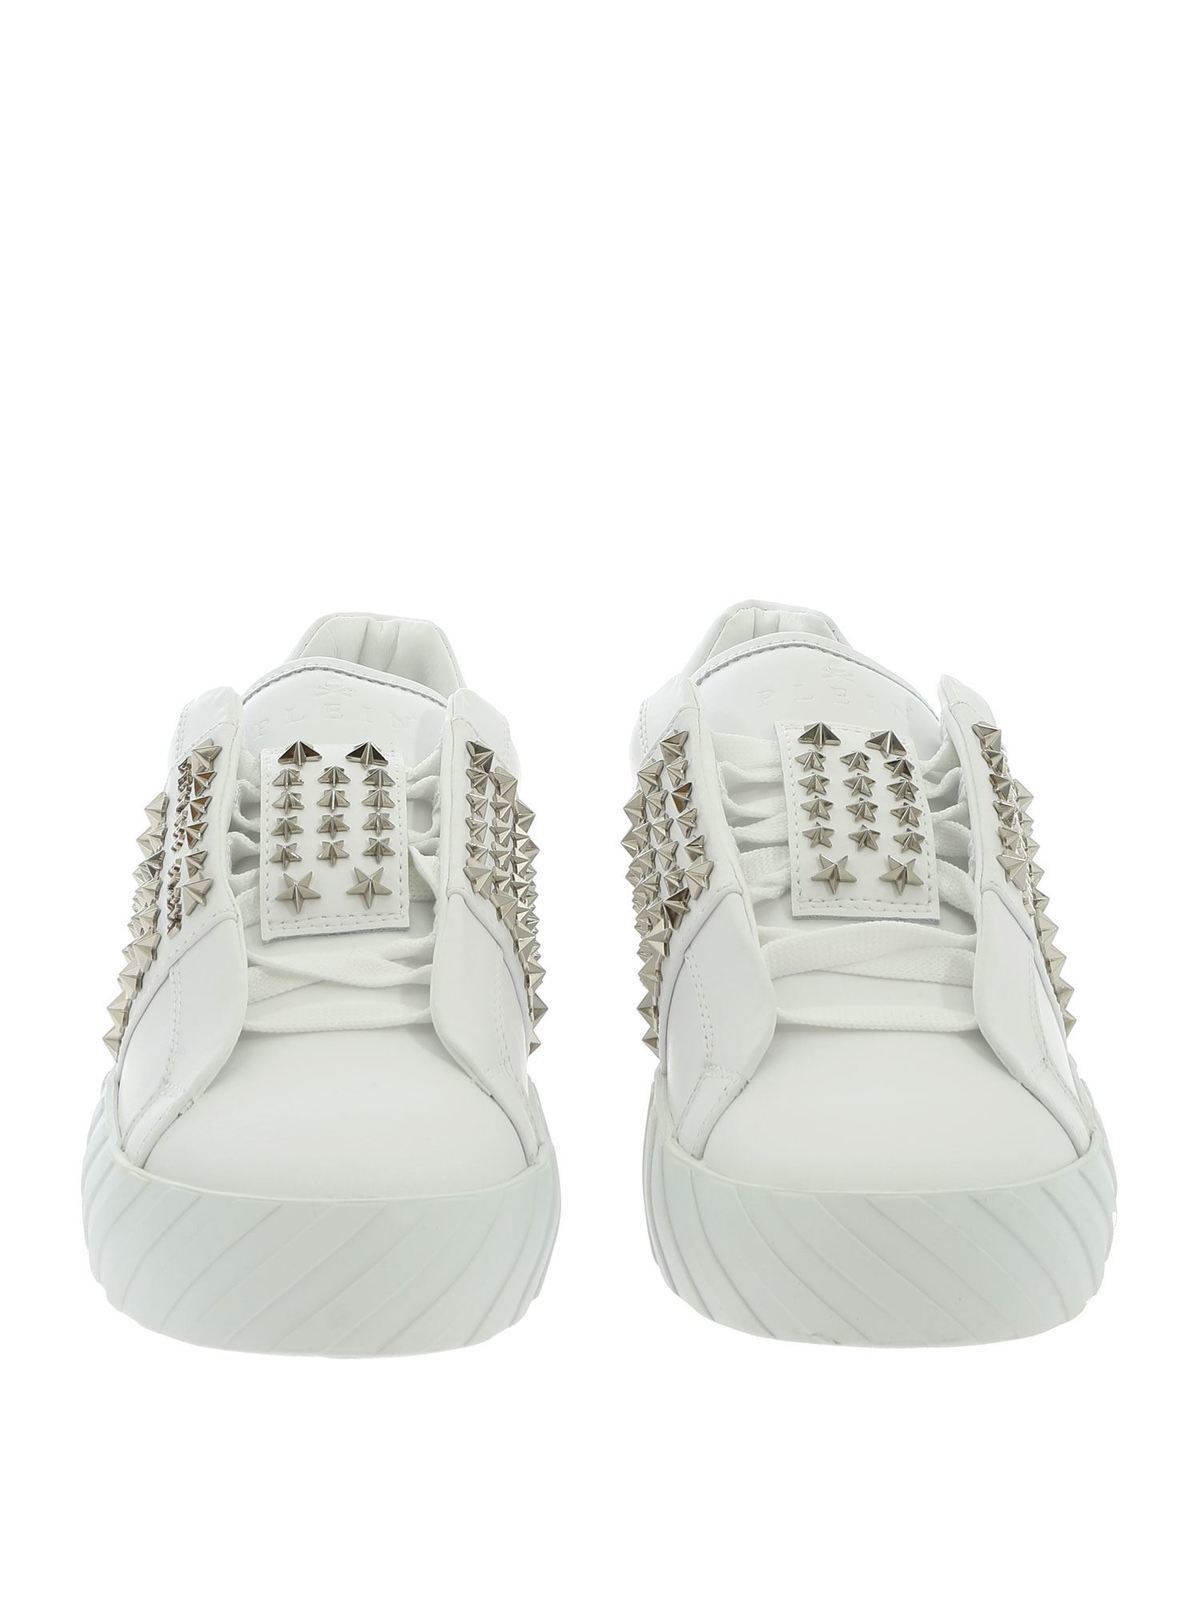 Philipp Plein - Studded sneakers in